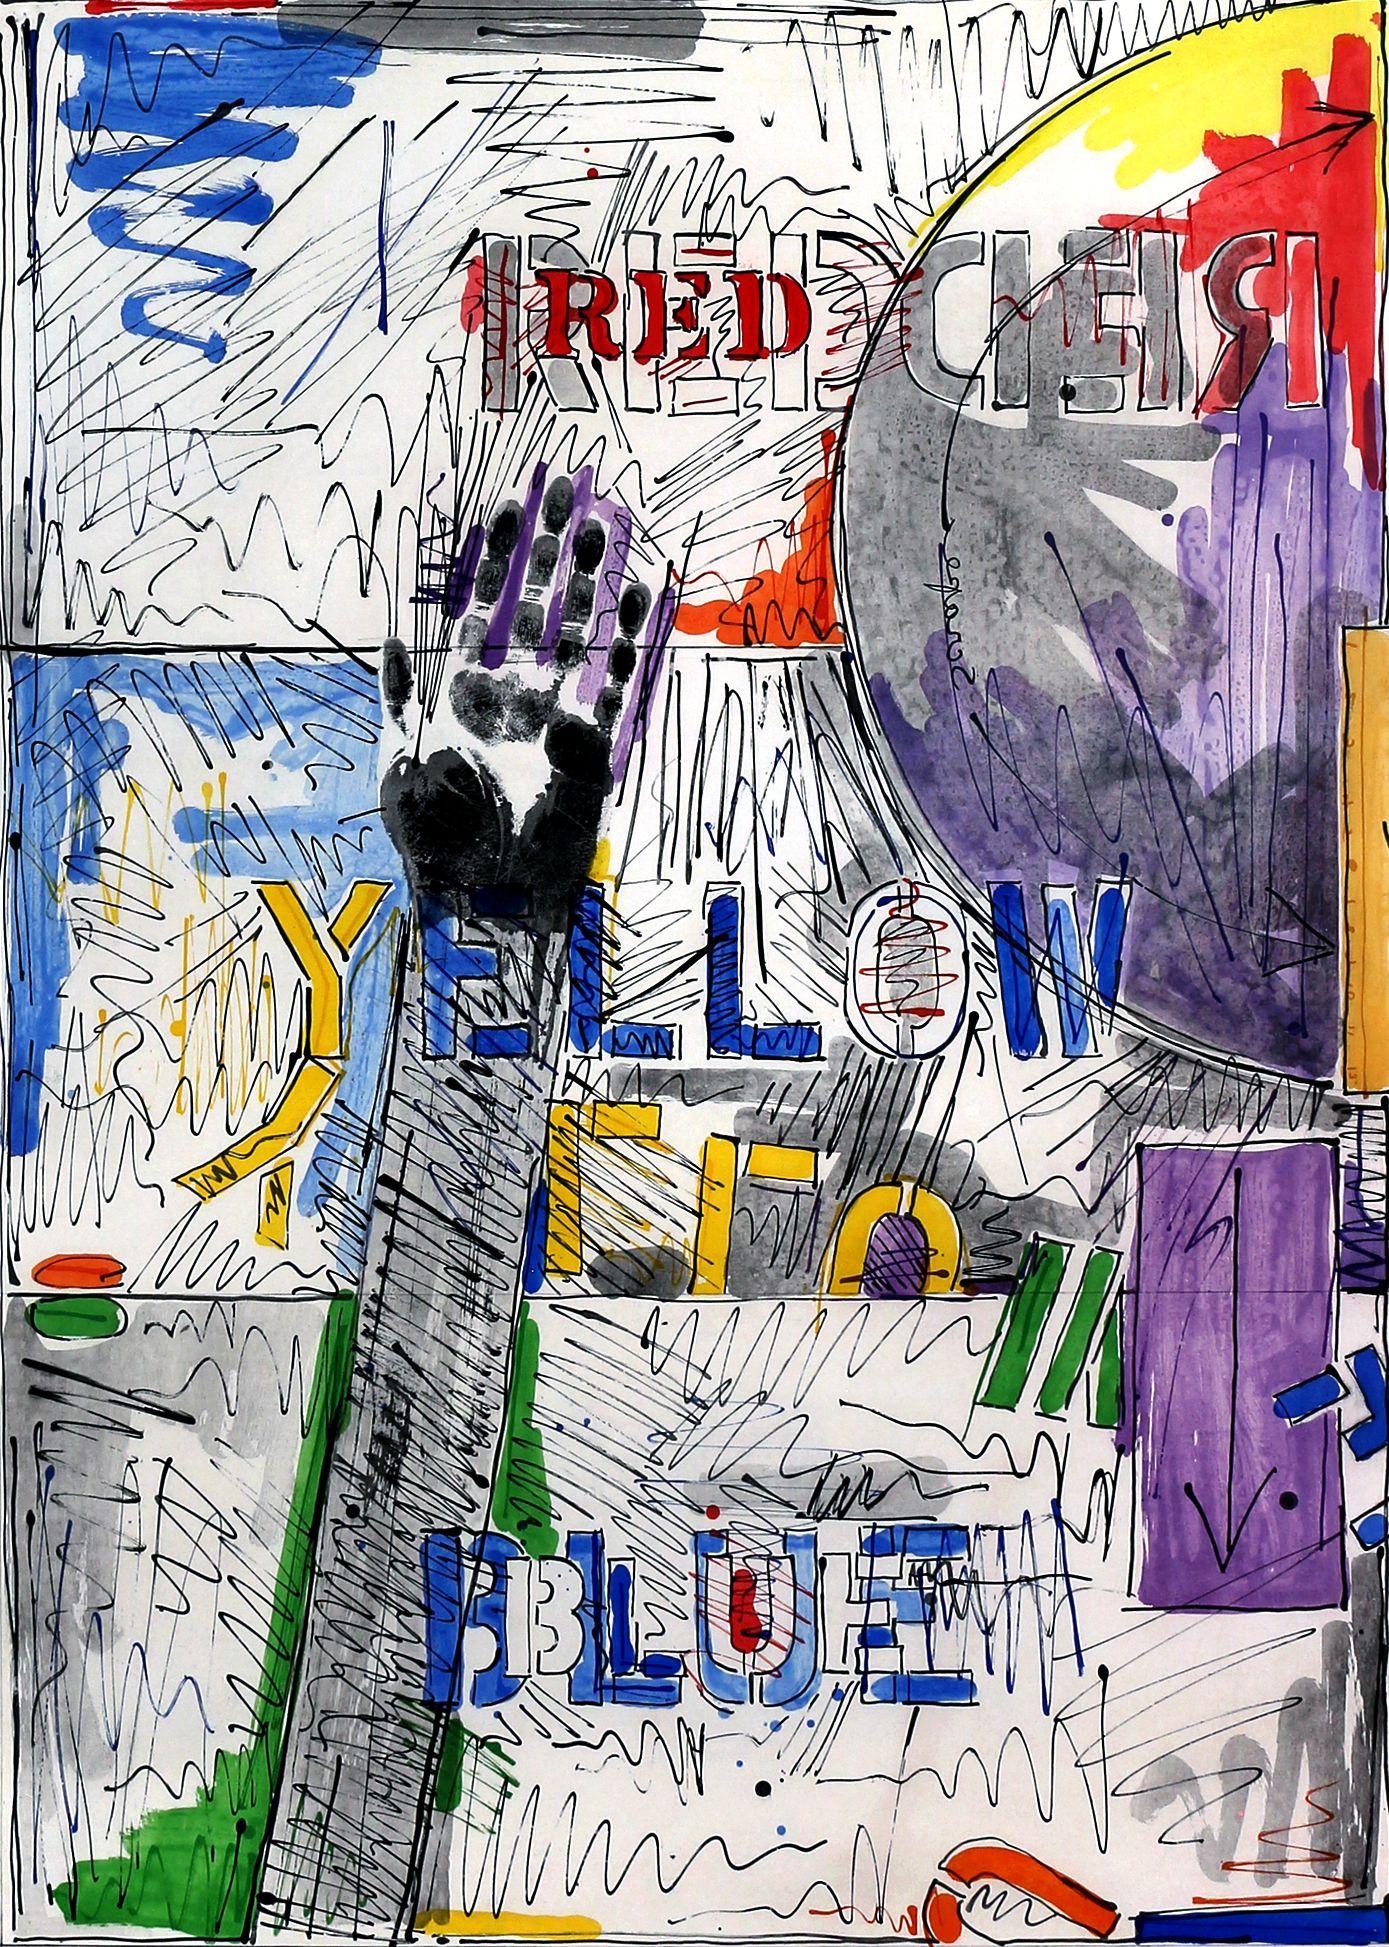 Land's End by Jasper Johns